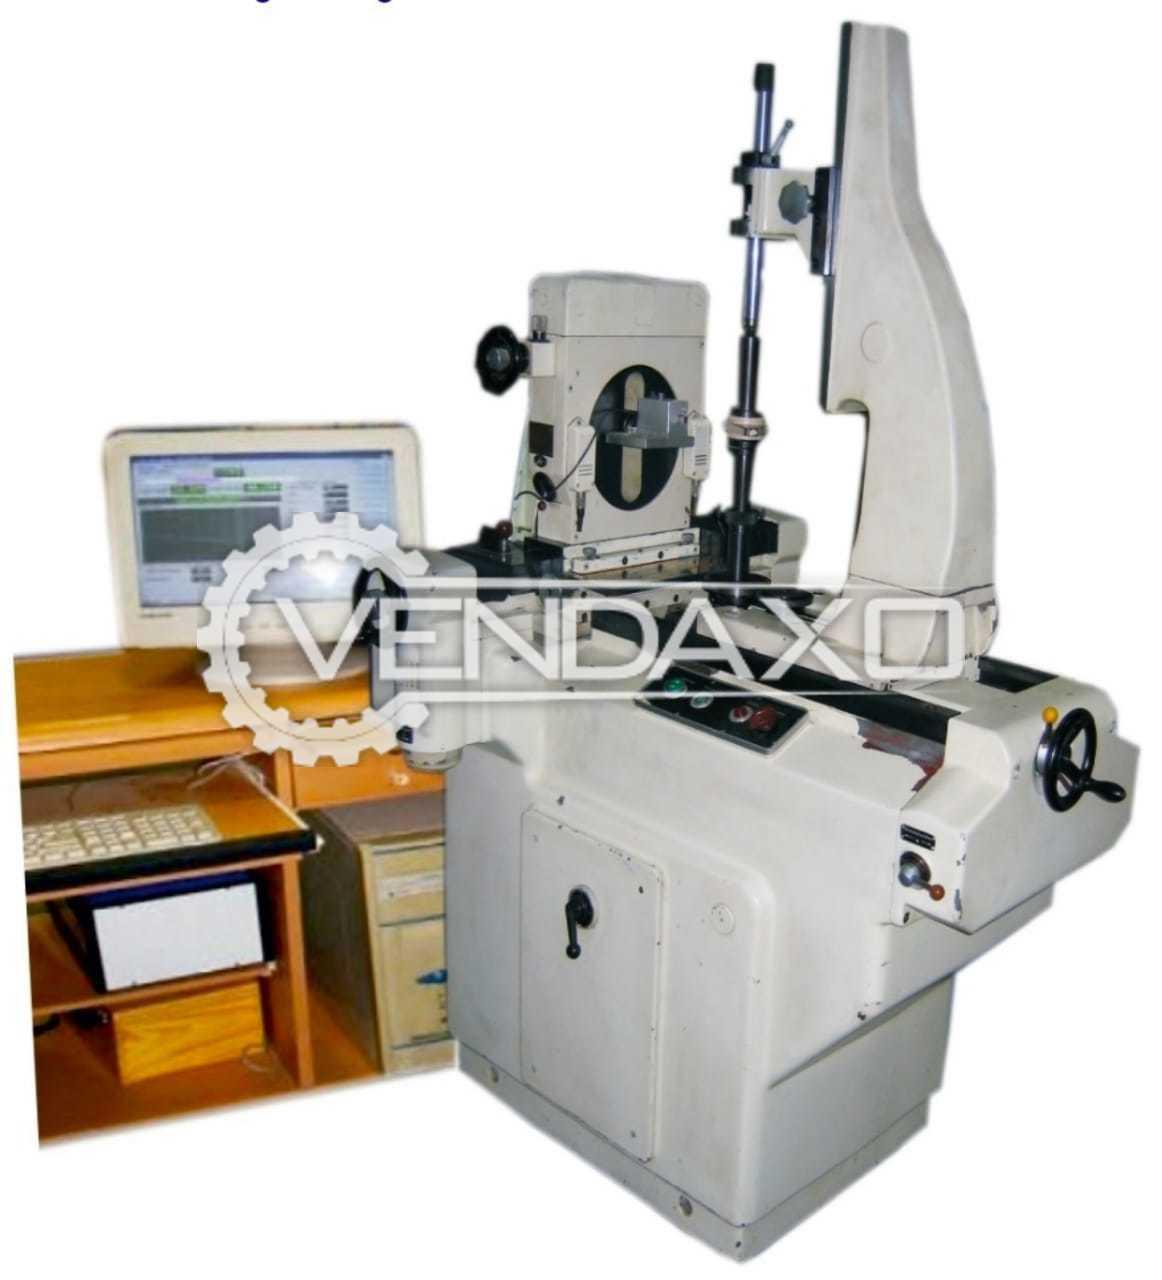 Klingelnberg PFS 600 Gear Lead and Profile Tester Machine - 15 to 600 mm